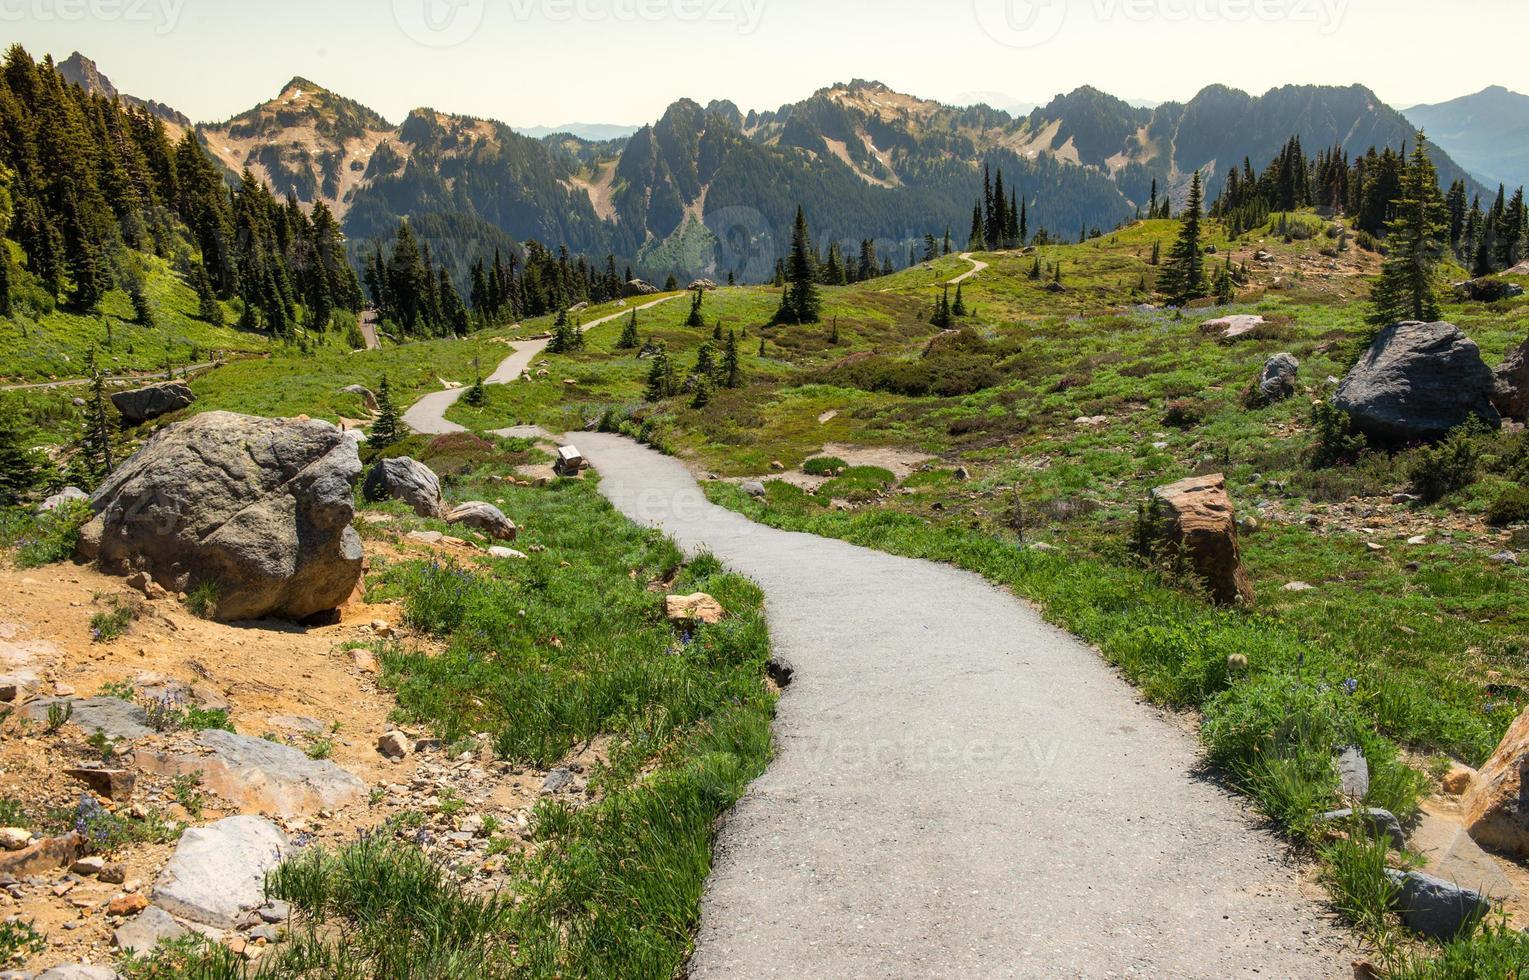 Paradise Trail Mt. Rainer photo